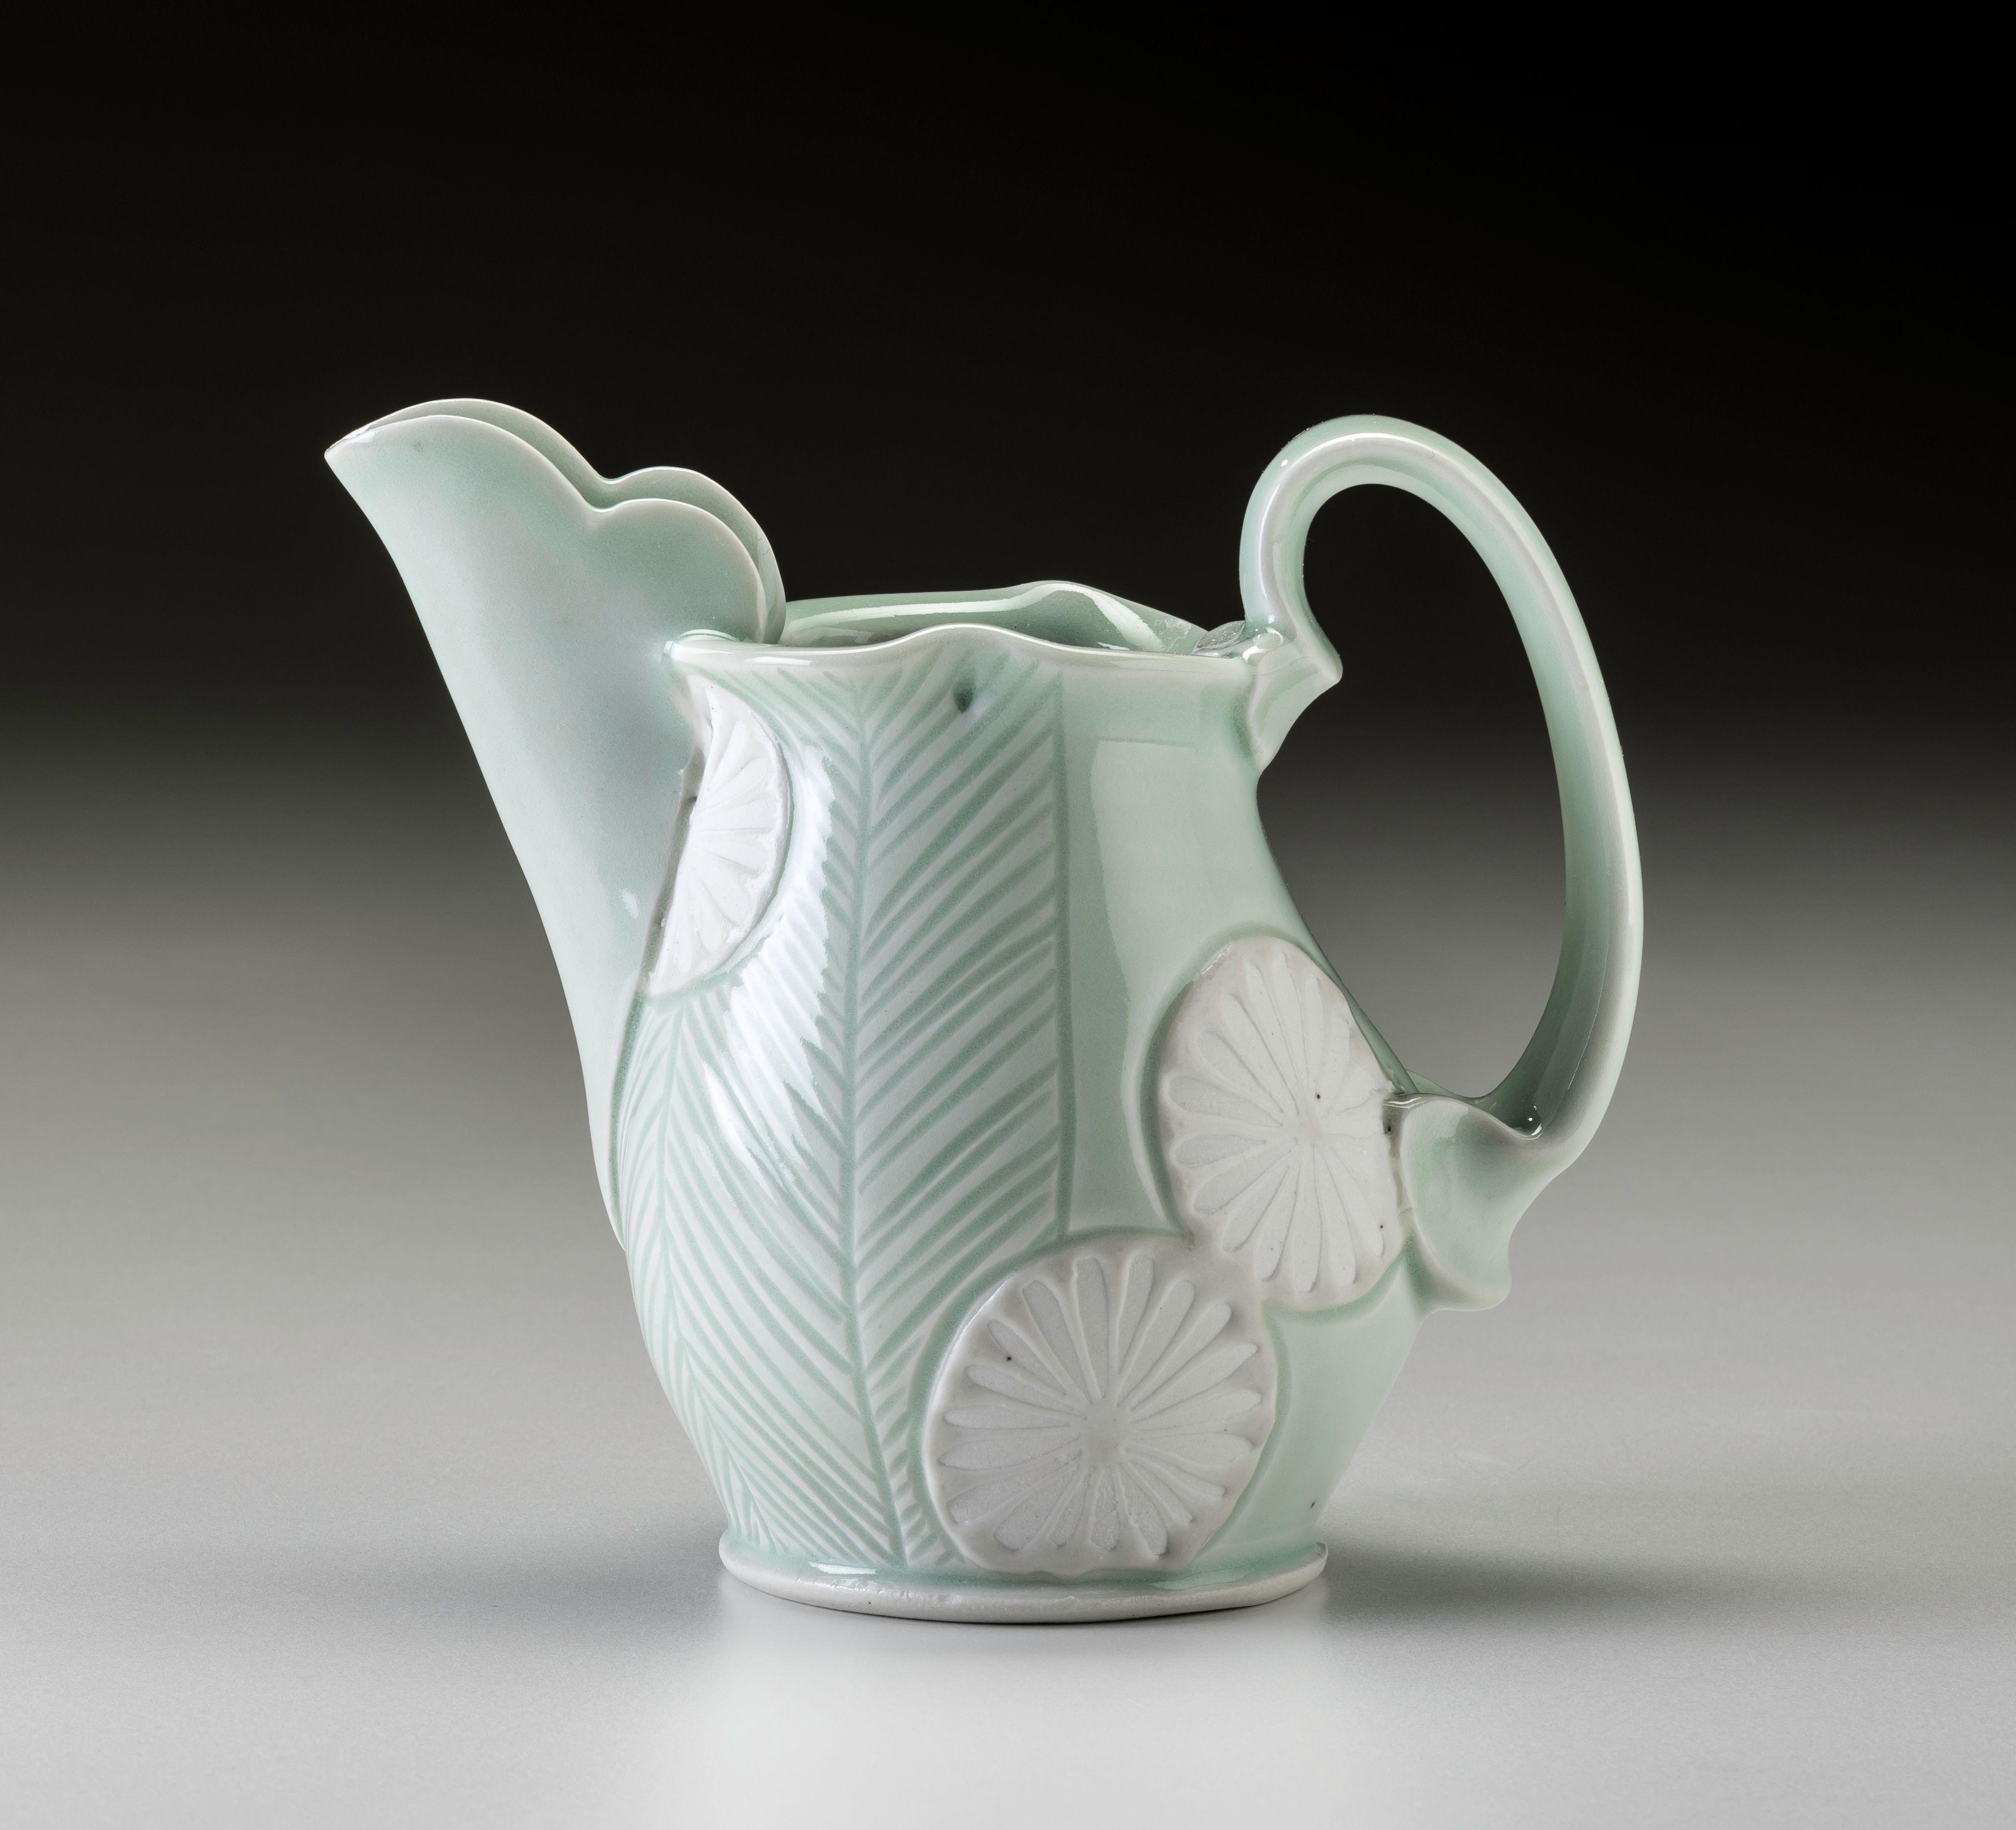 Functional Ceramics - Coming Soon to WCA!